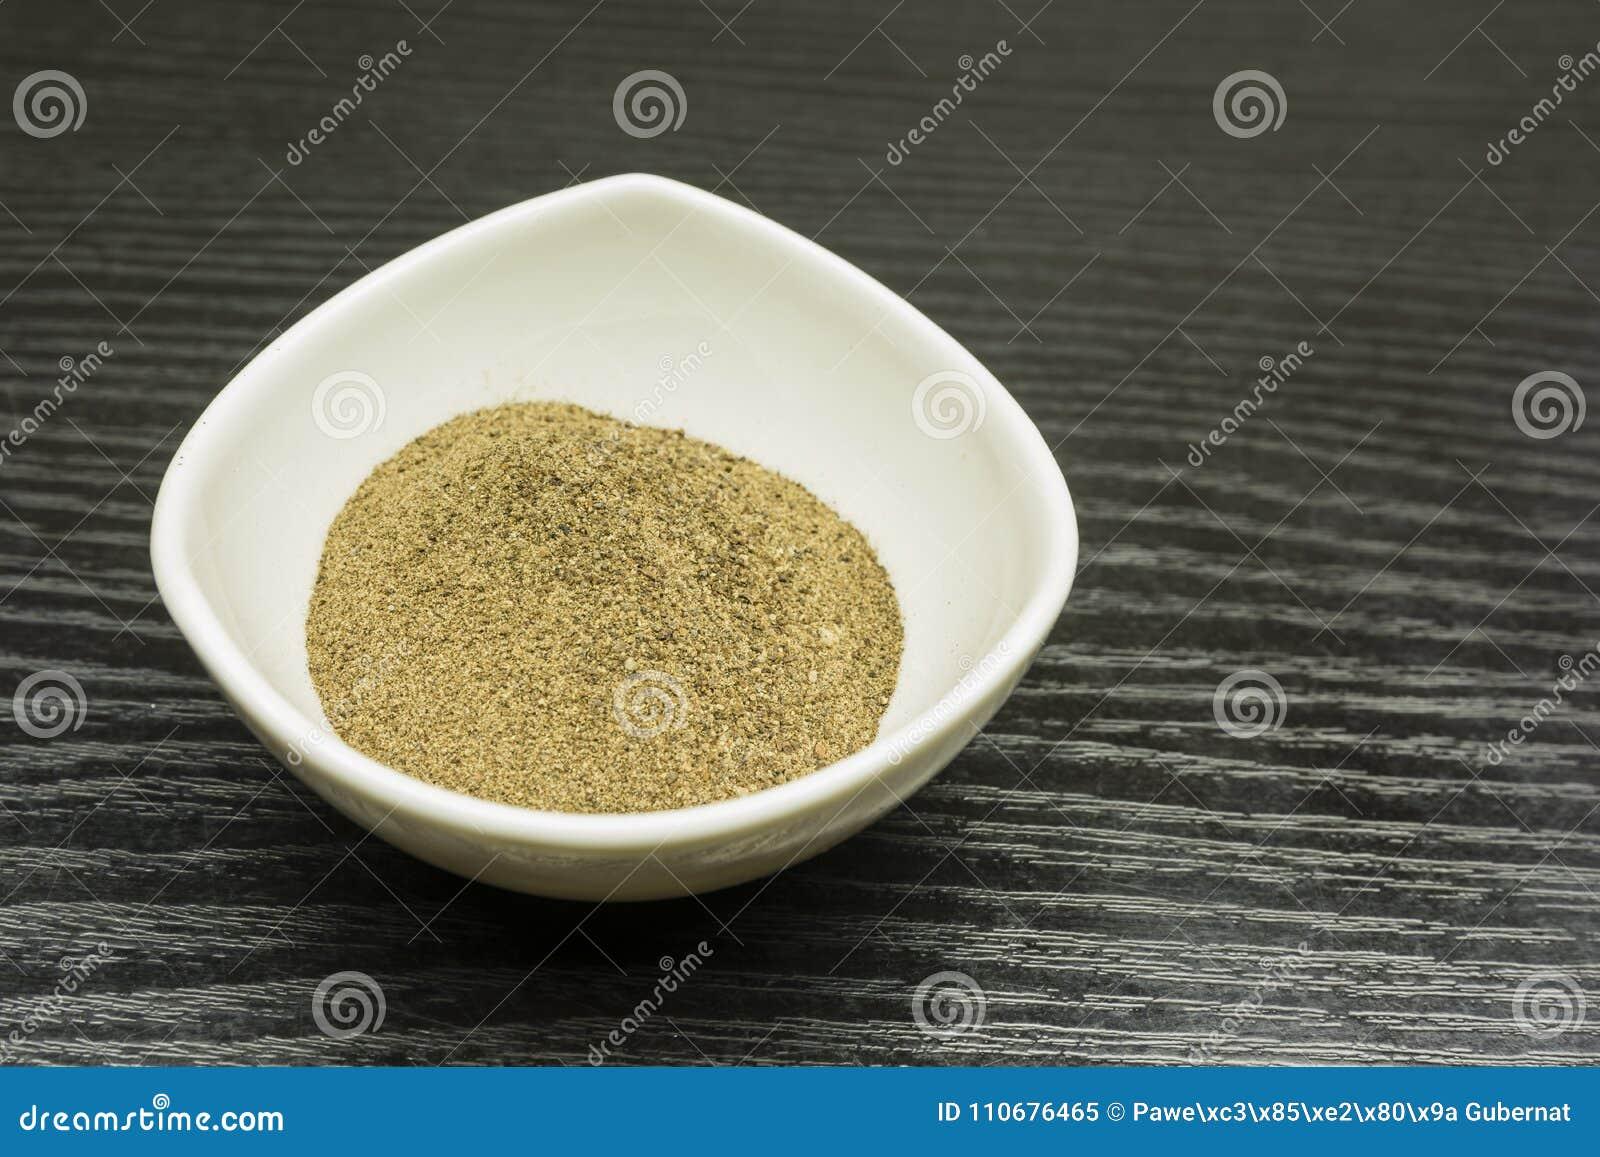 Ground black pepper in a bowl.